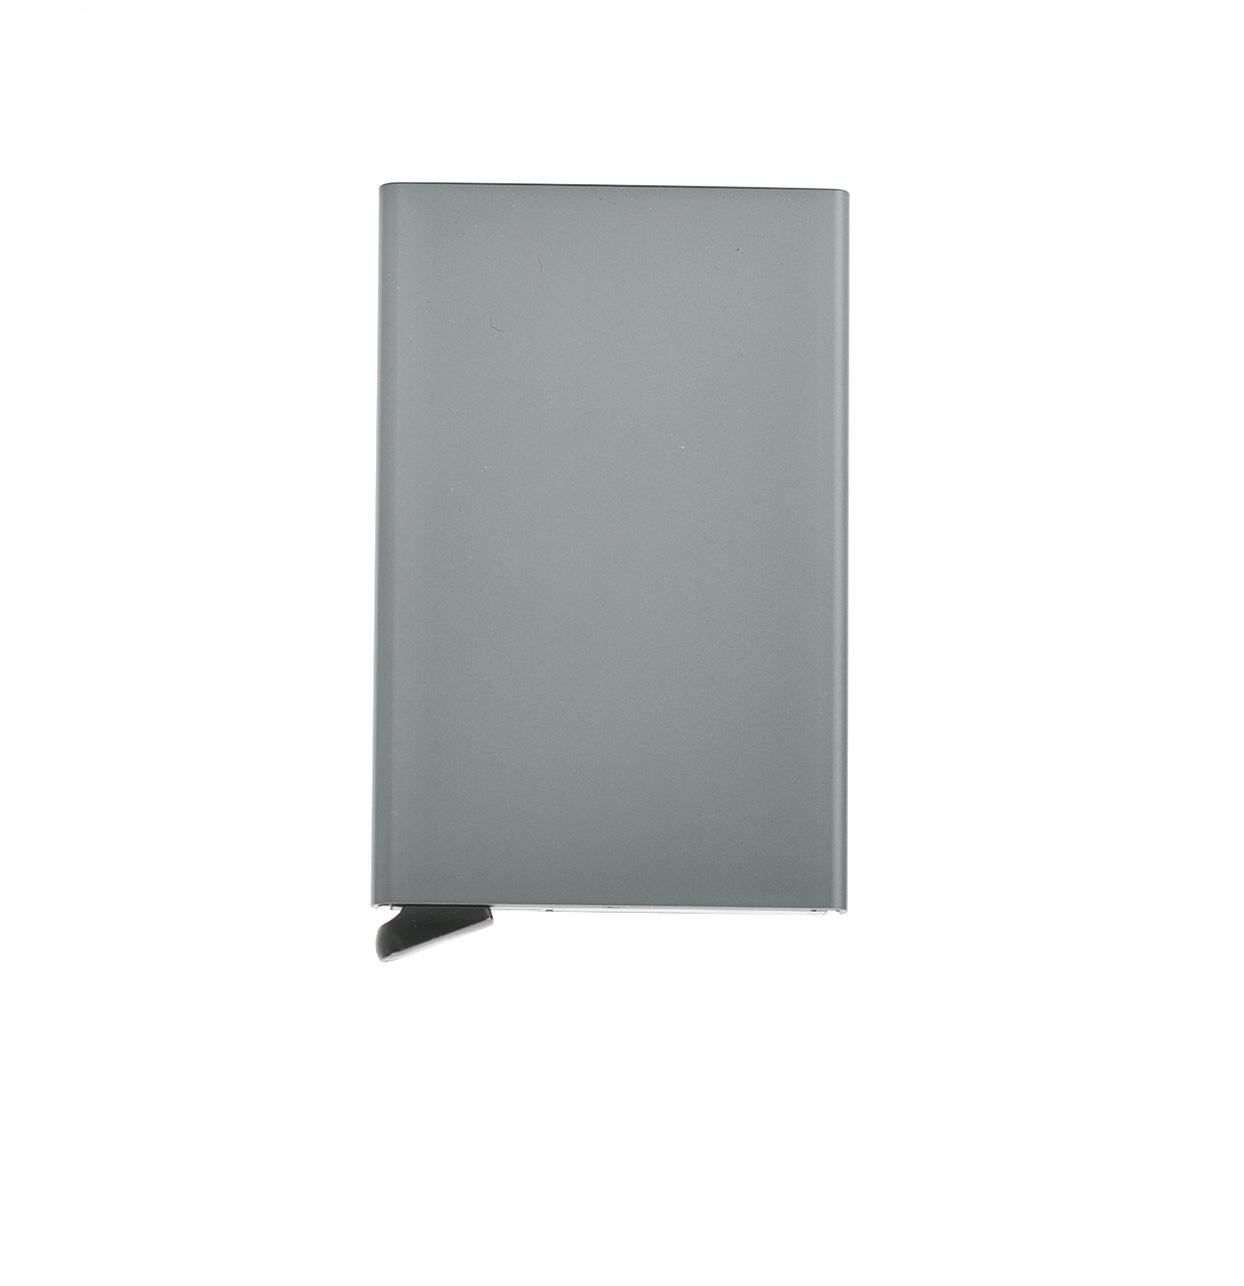 Tarjetero Secrid slim wallet aluminio color plomo.